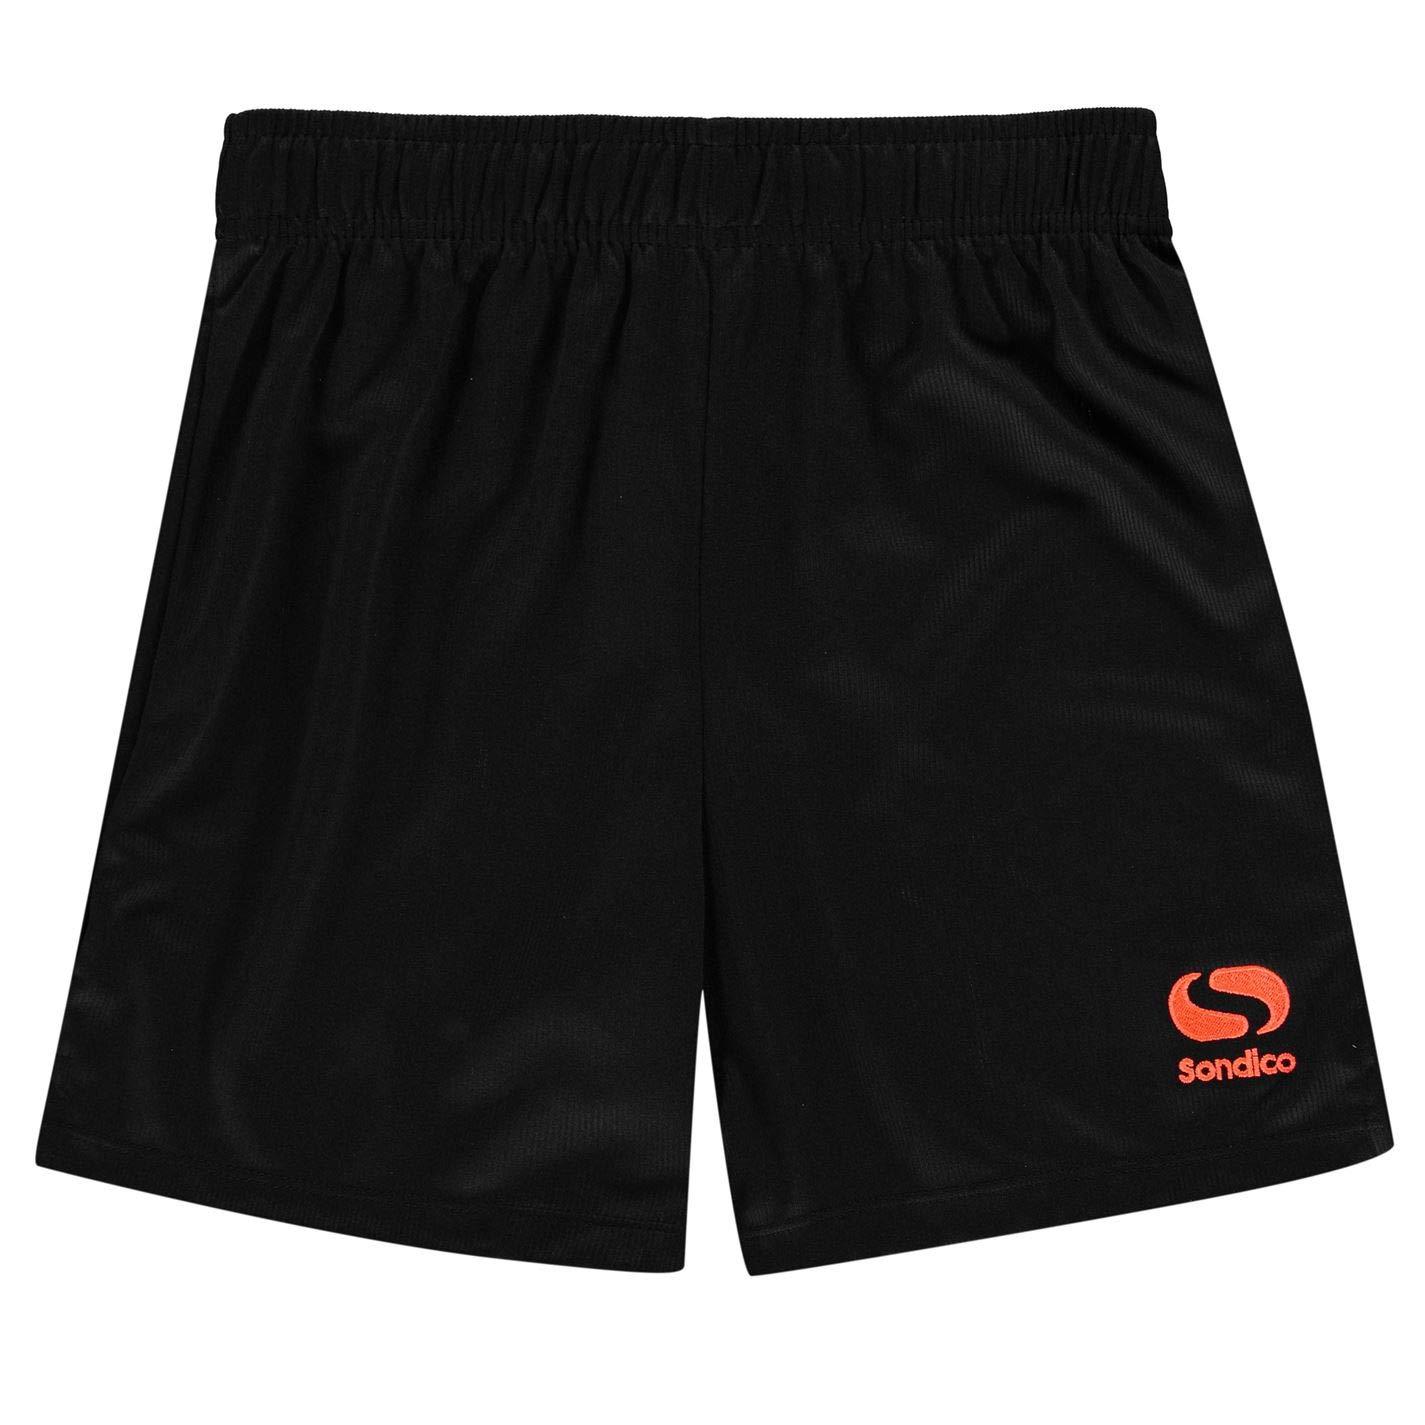 Sondico Kids Boys Core Football Shorts Junior Pants Trousers